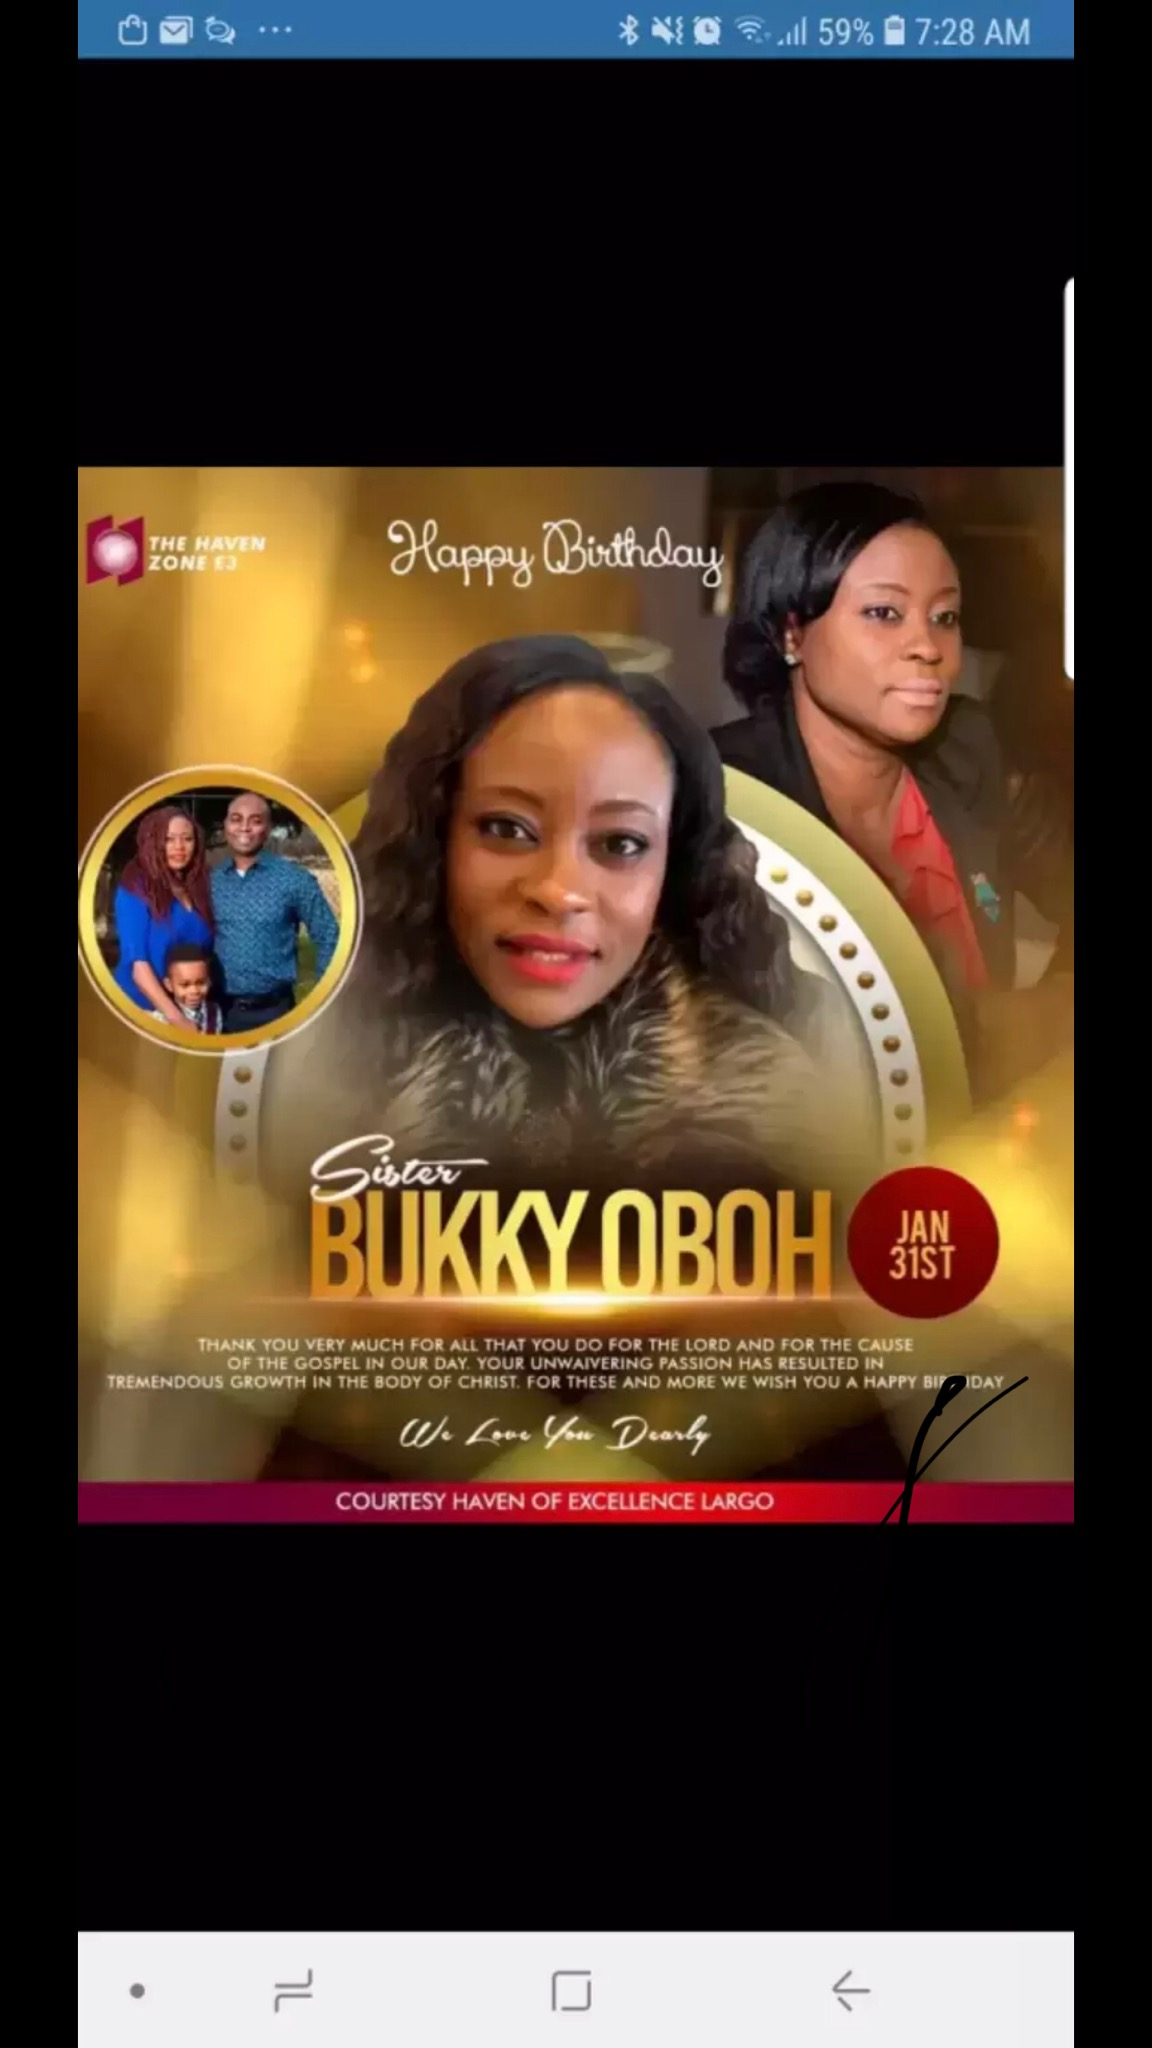 Happy birthday, Sis Buki! Your